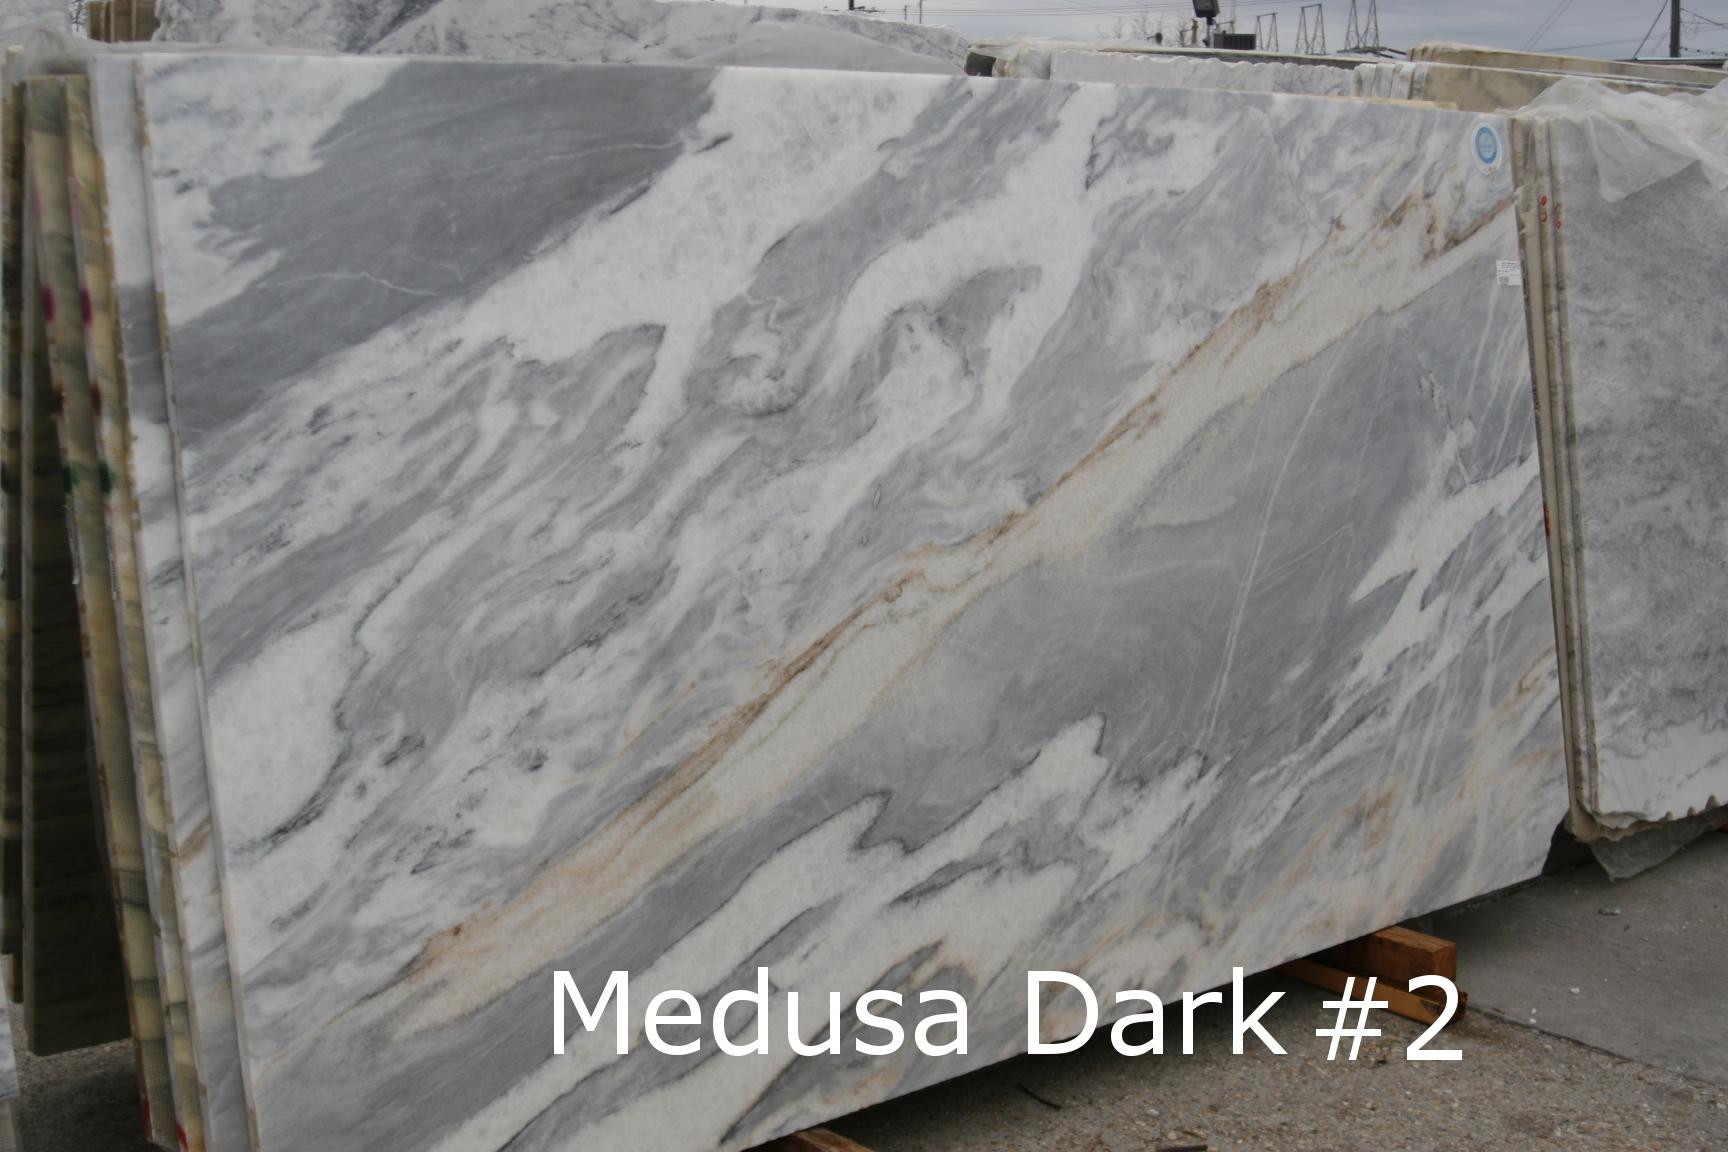 Medusa Dark #2